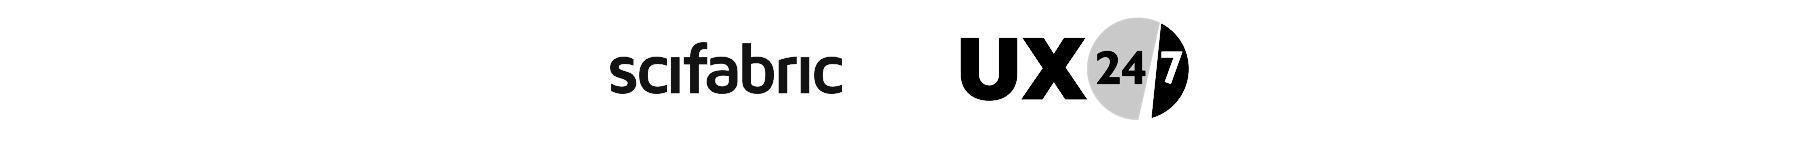 logos-colaborations-black.jpg